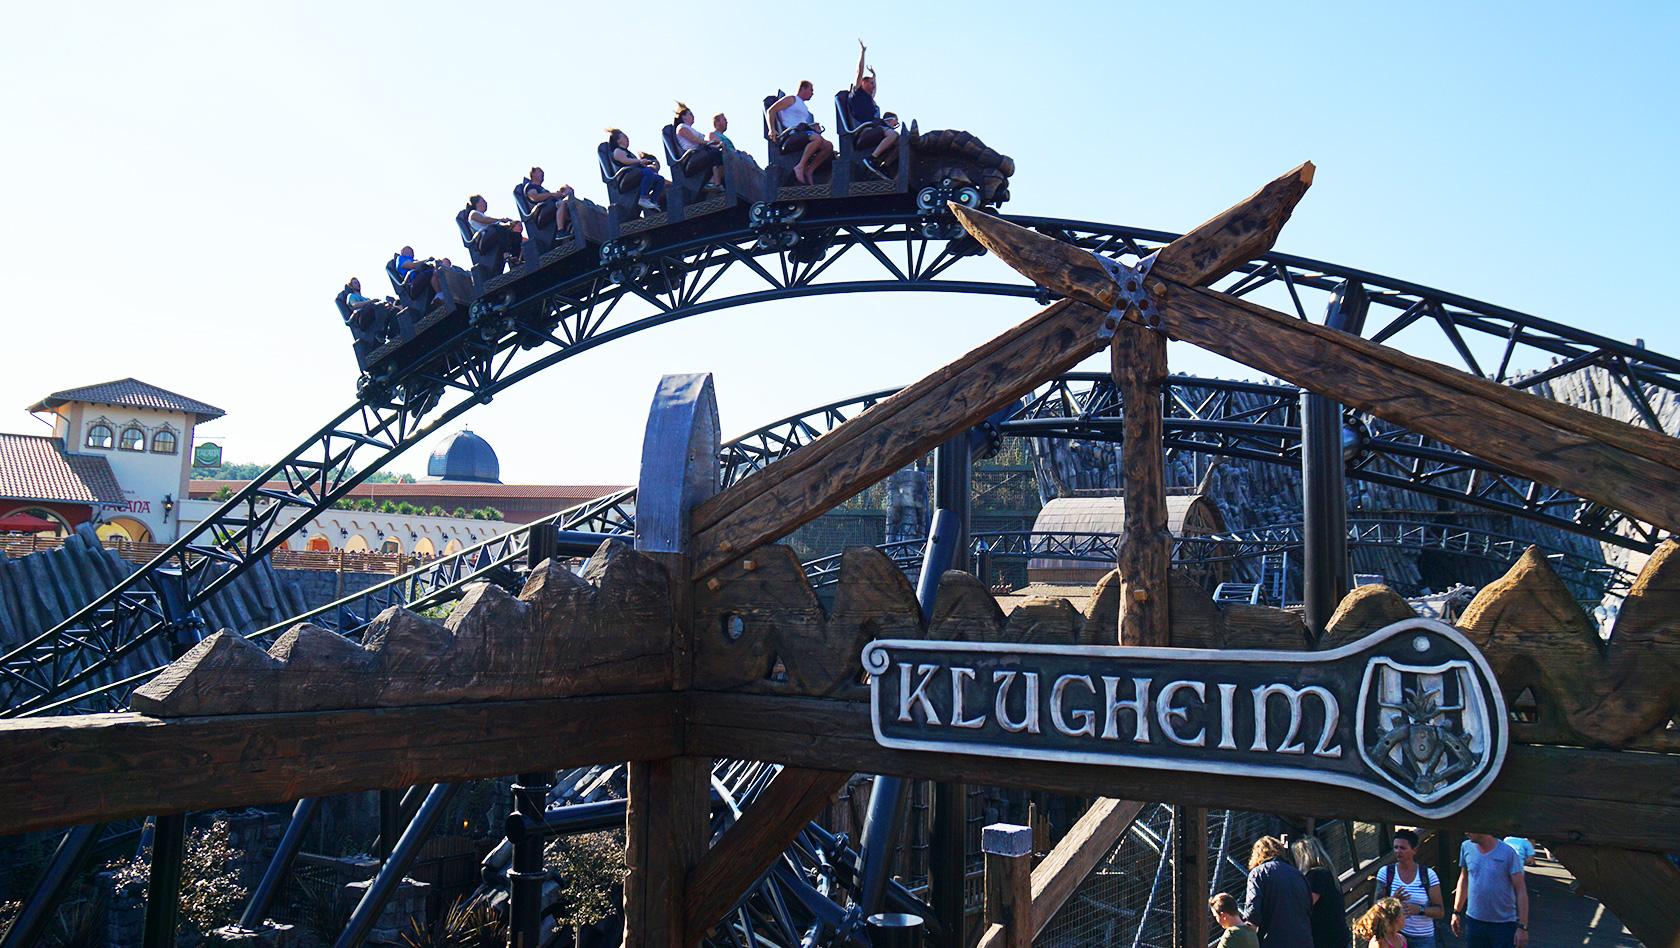 Klugheim | Bild Copyright by Thomas Frank, Parkerlebnis.de